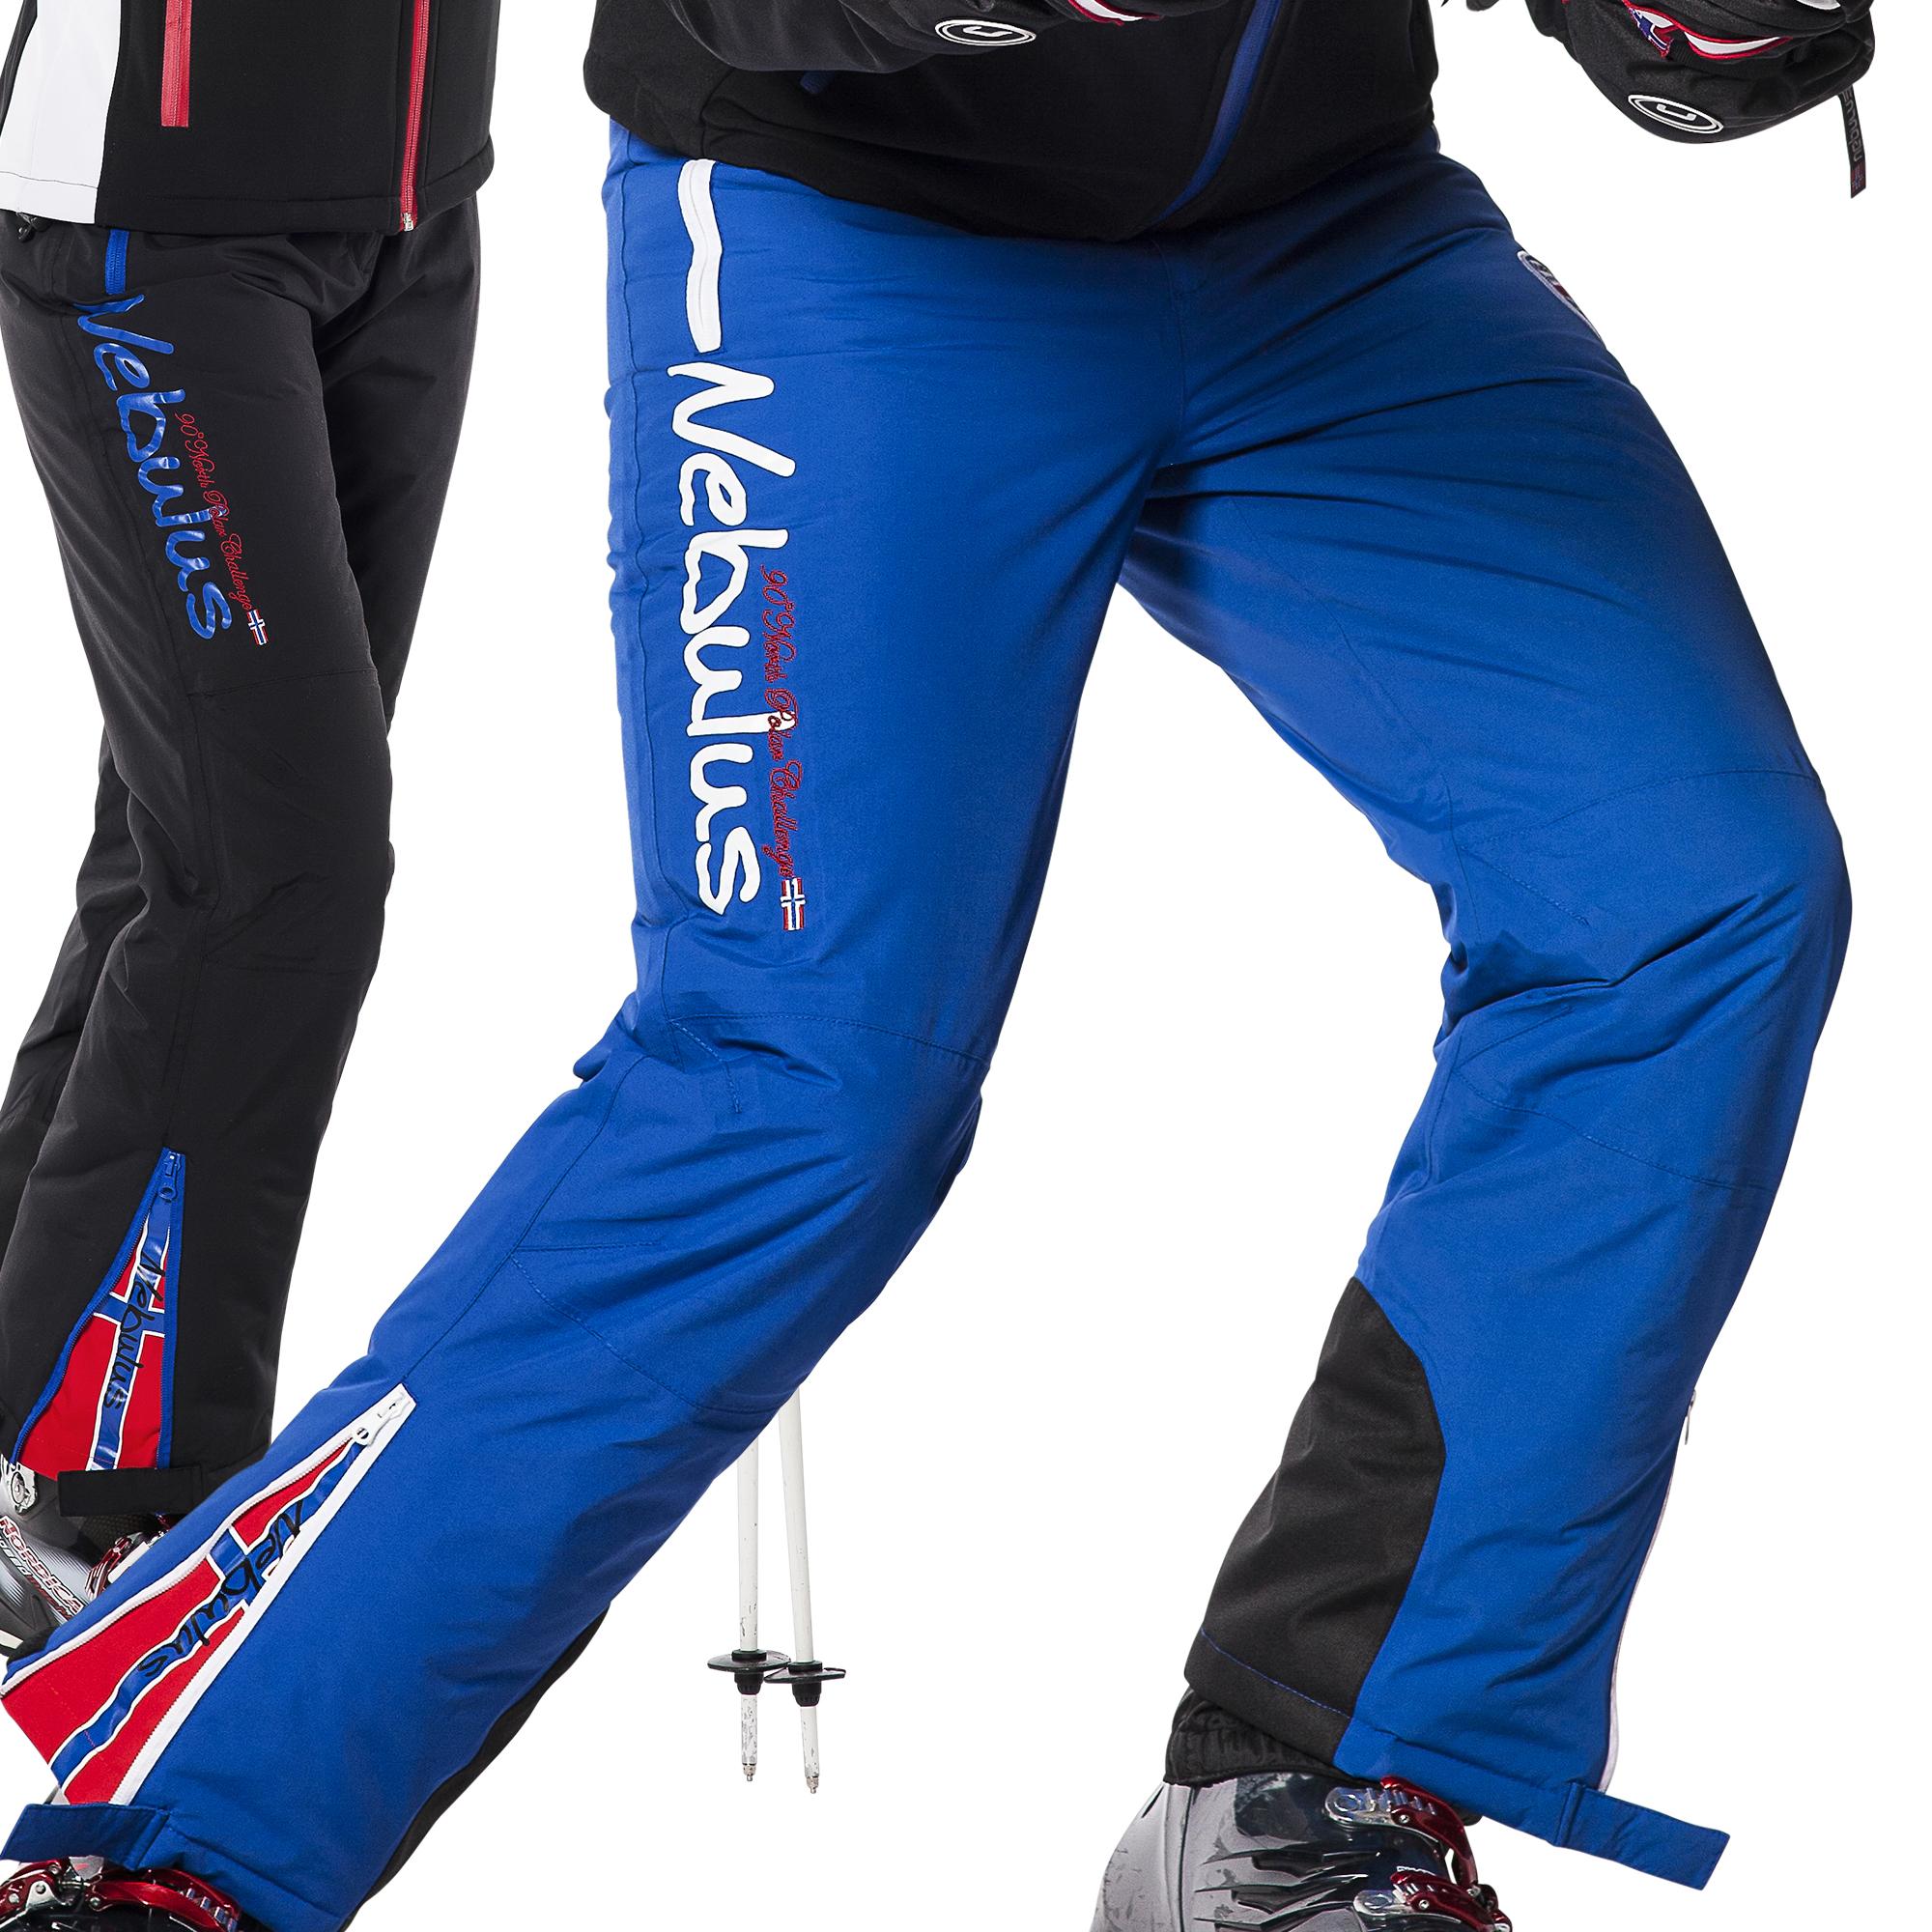 Nebulus Pantaloni da sci Downforce, Uomo/donna / bambini, sci, snowboard (T144)